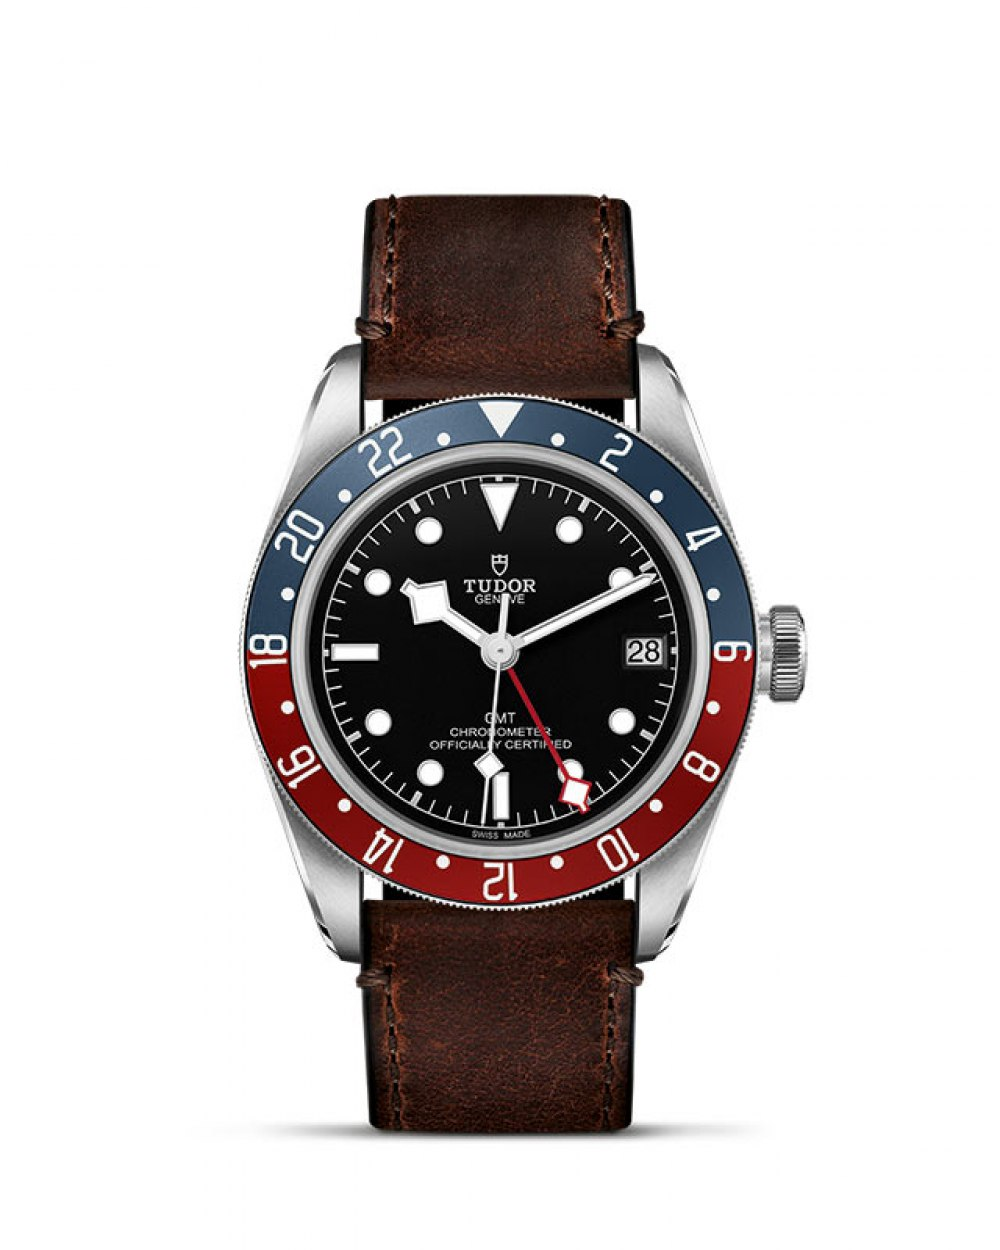 TUDOR Black Bay GMT M79830RB-0002